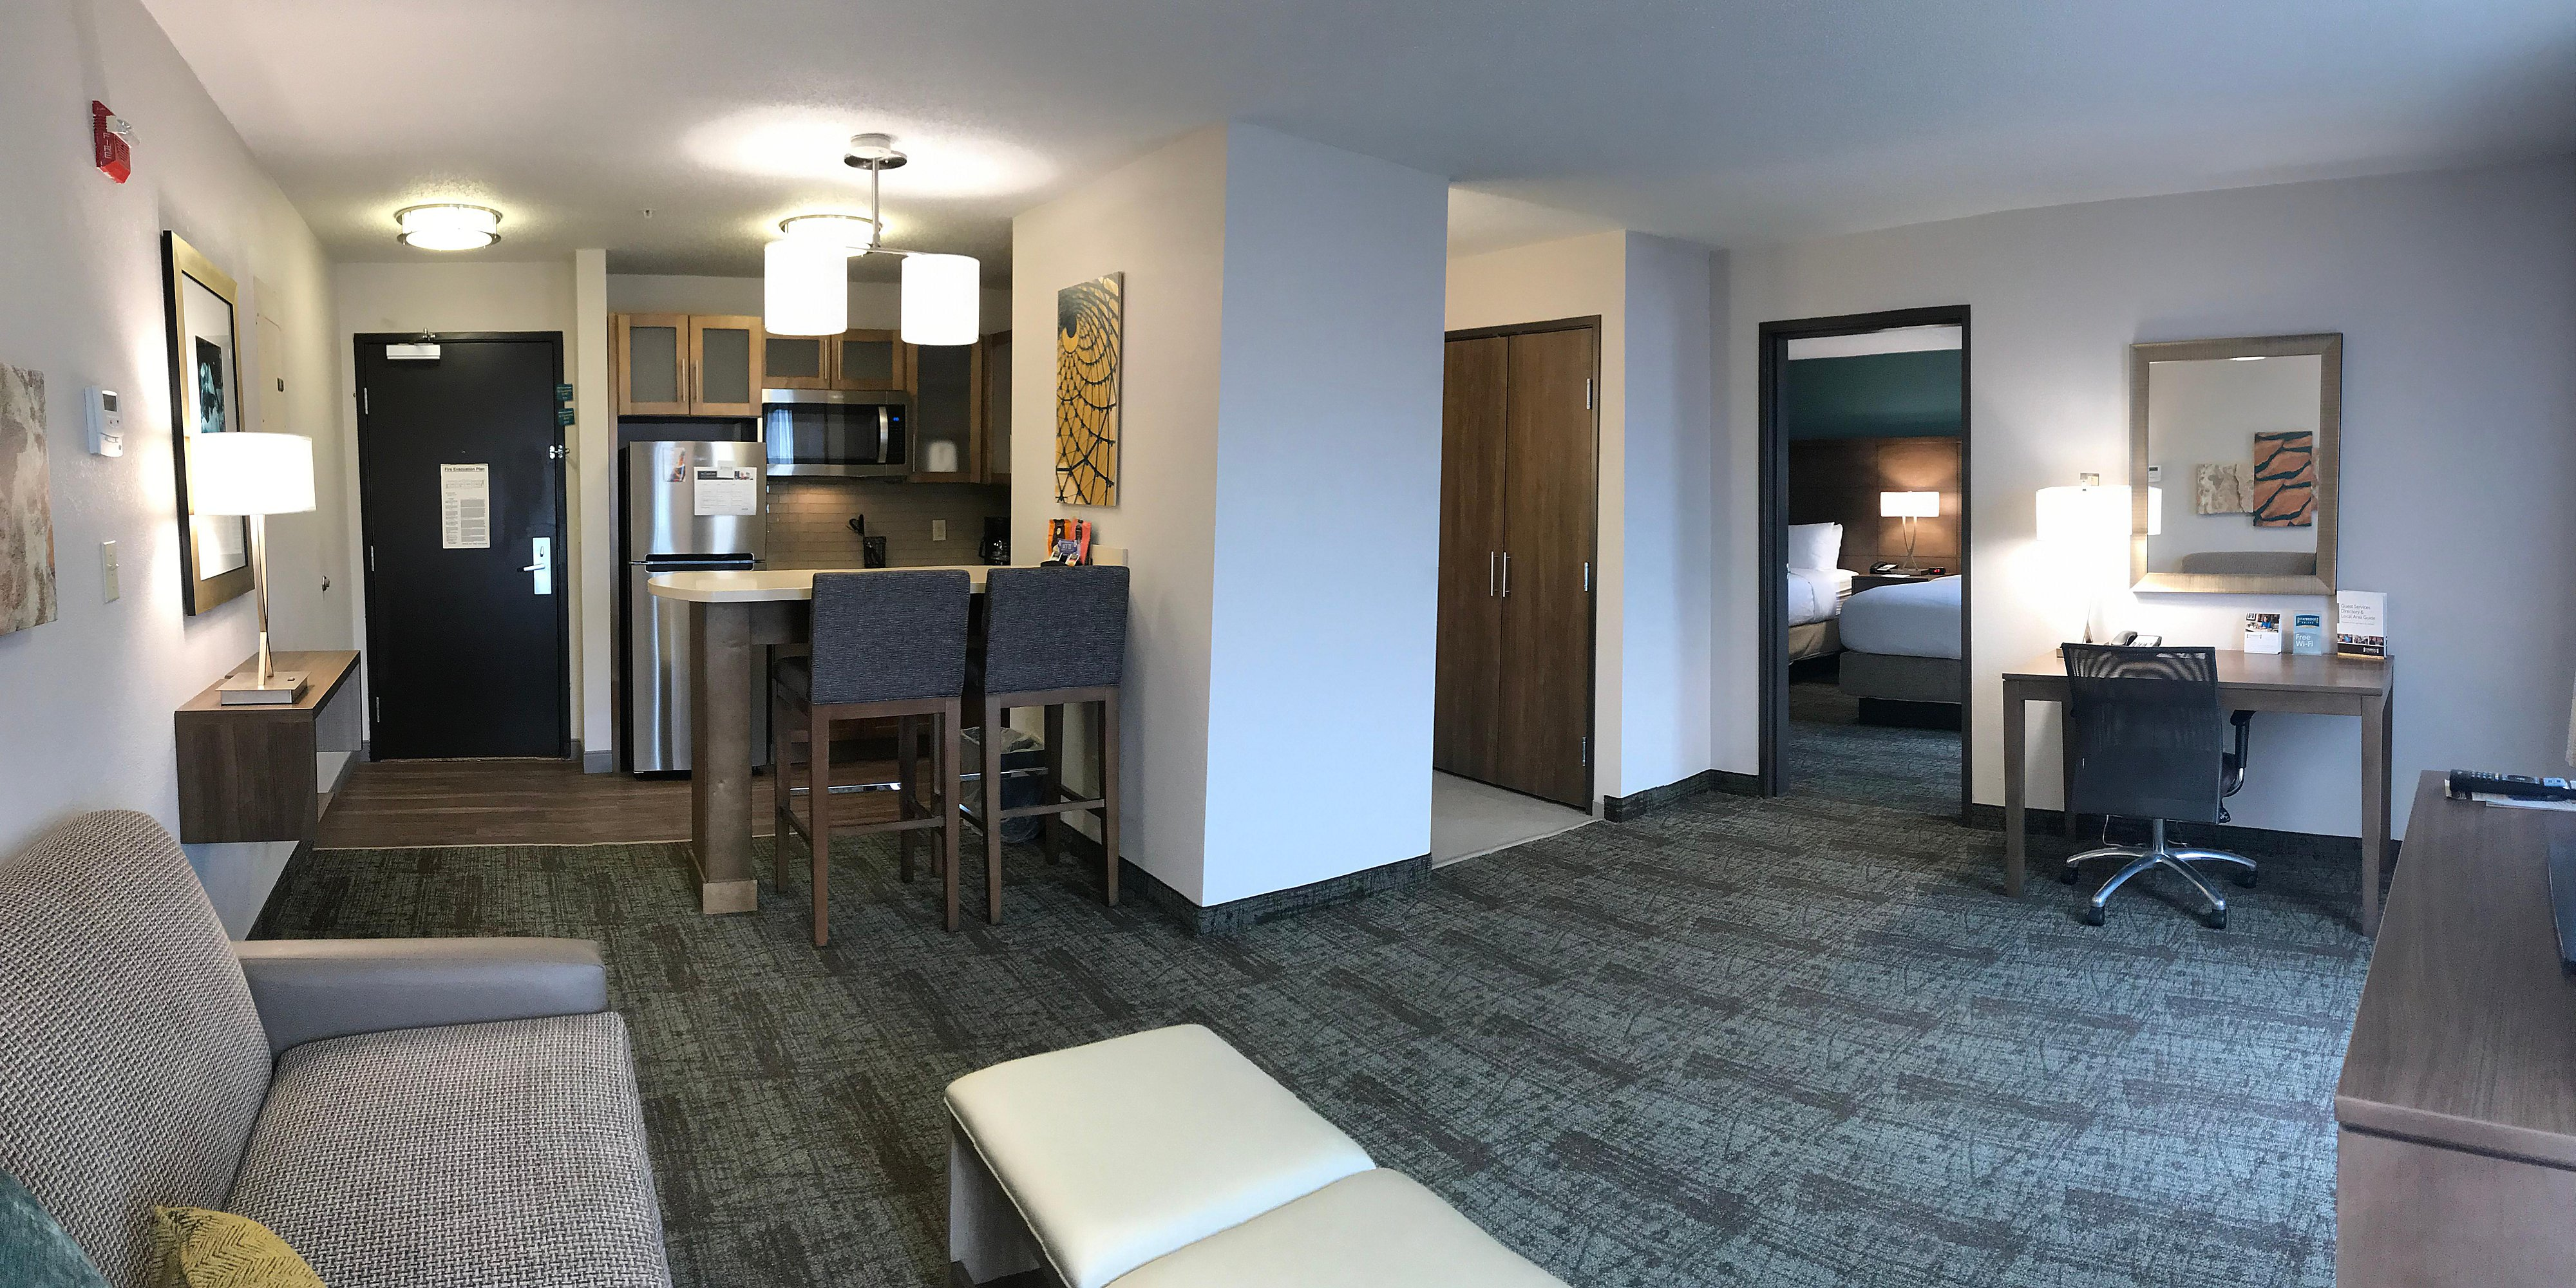 Staybridge Suites Columbia Hotels Staybridge Suites Columbia Hwy 63 I 70 Hotel Room Rates